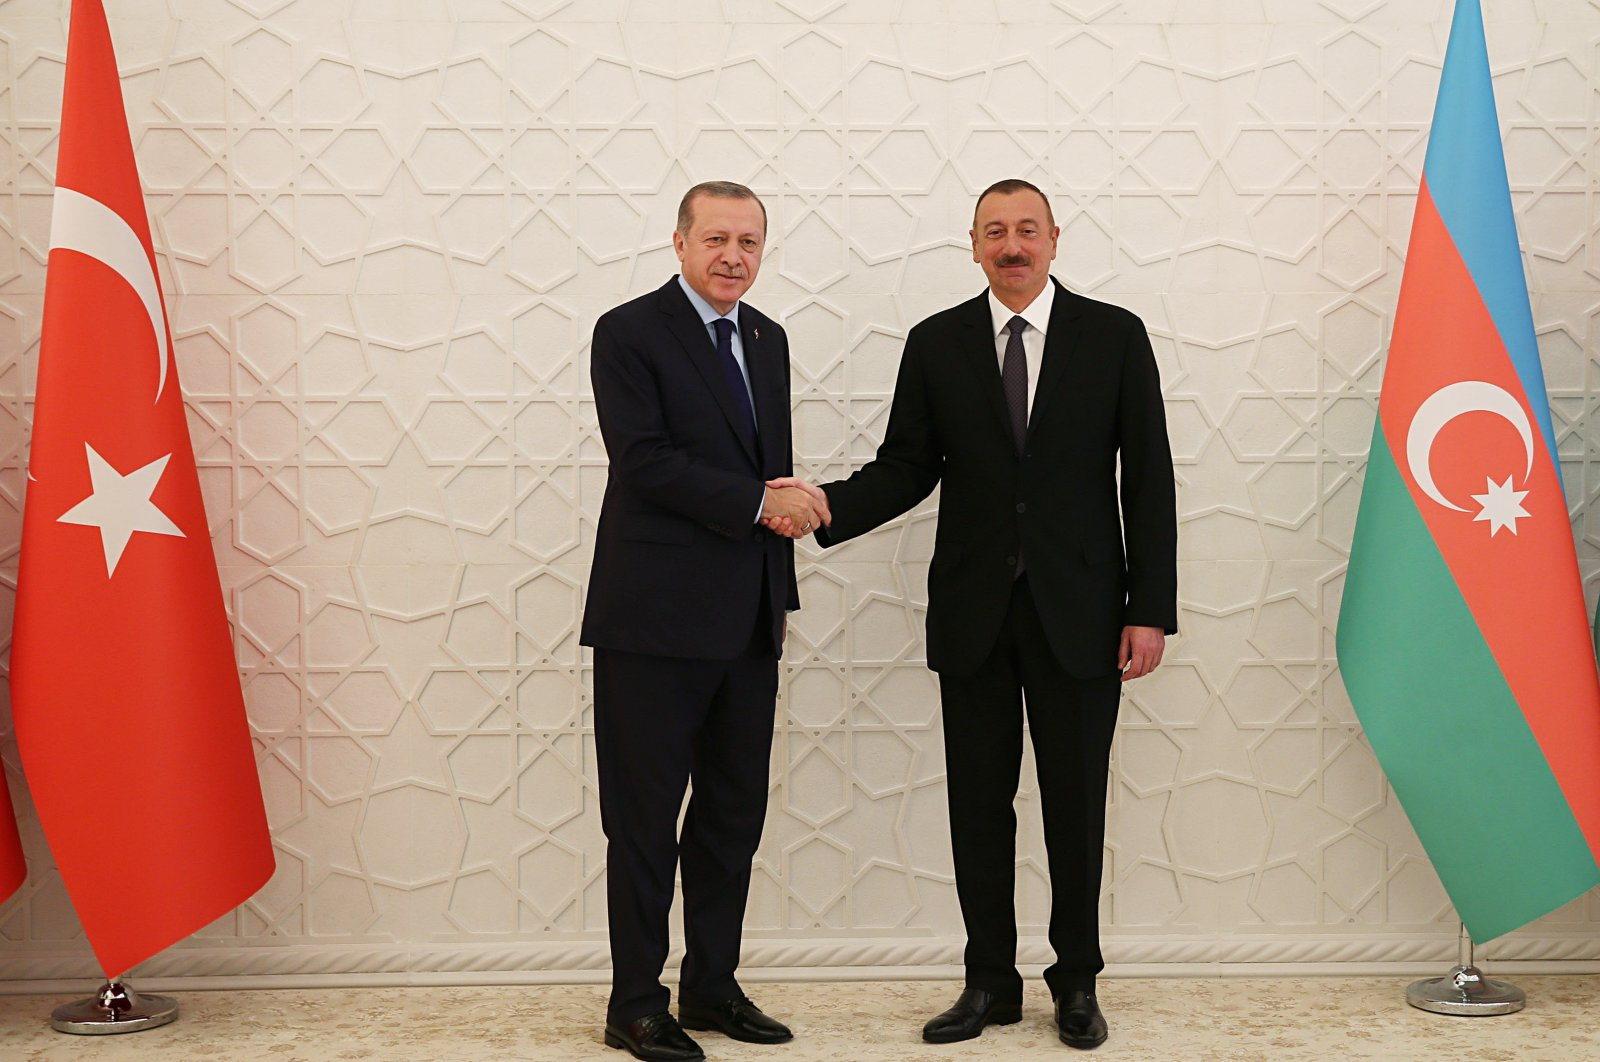 President Recep Tayyip Erdoğan and Azerbaijani President Ilham Aliyev shake hands following a meeting at the Presidential Complex in Ankara, Turkey, Feb. 12, 2020. (Presidency handout)